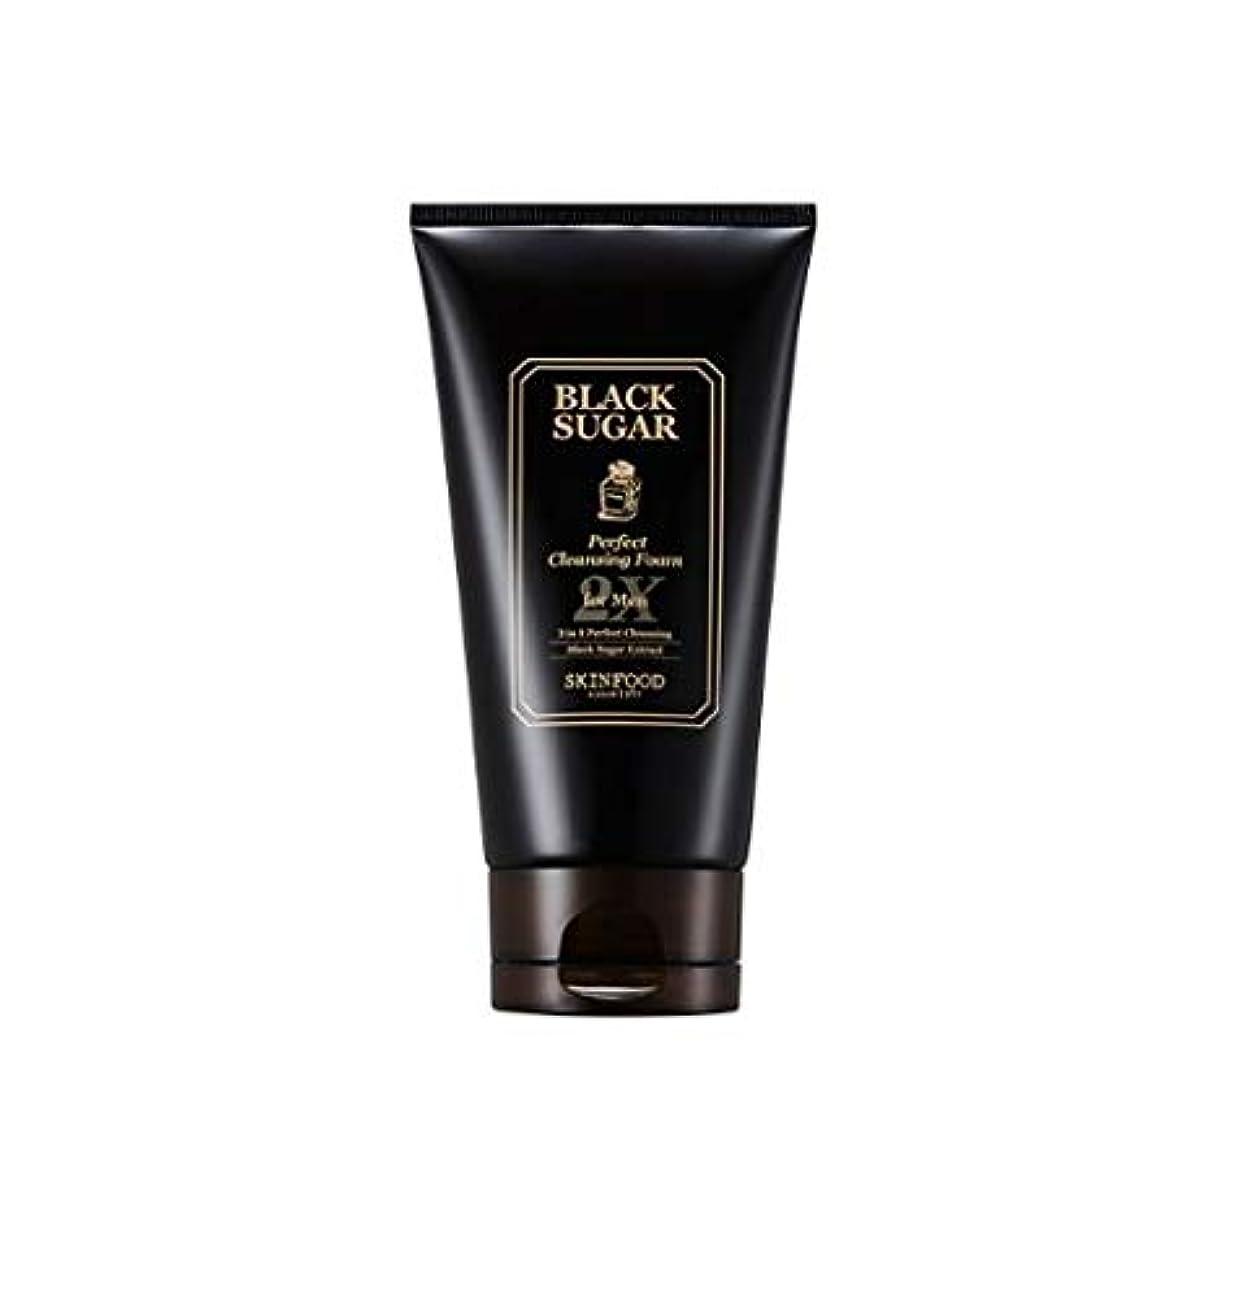 Skinfood 男性用ブラックシュガーパーフェクトクレンジングフォーム2X / Black Sugar Perfect Cleansing Foam 2X for Men 150ml [並行輸入品]